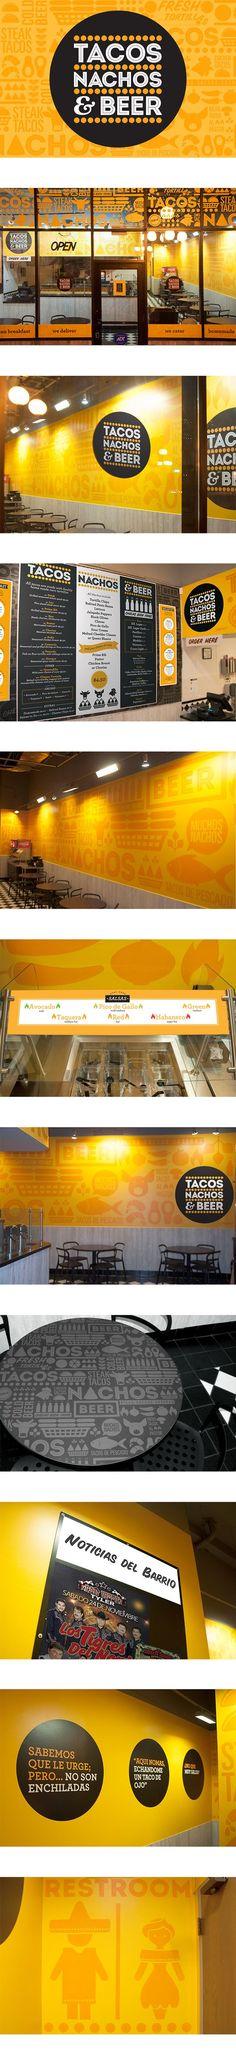 Tacos Nachos and Beer Restaurant Branding on Behance   Fivestar Branding – Design and Branding Agency & Inspiration Gallery